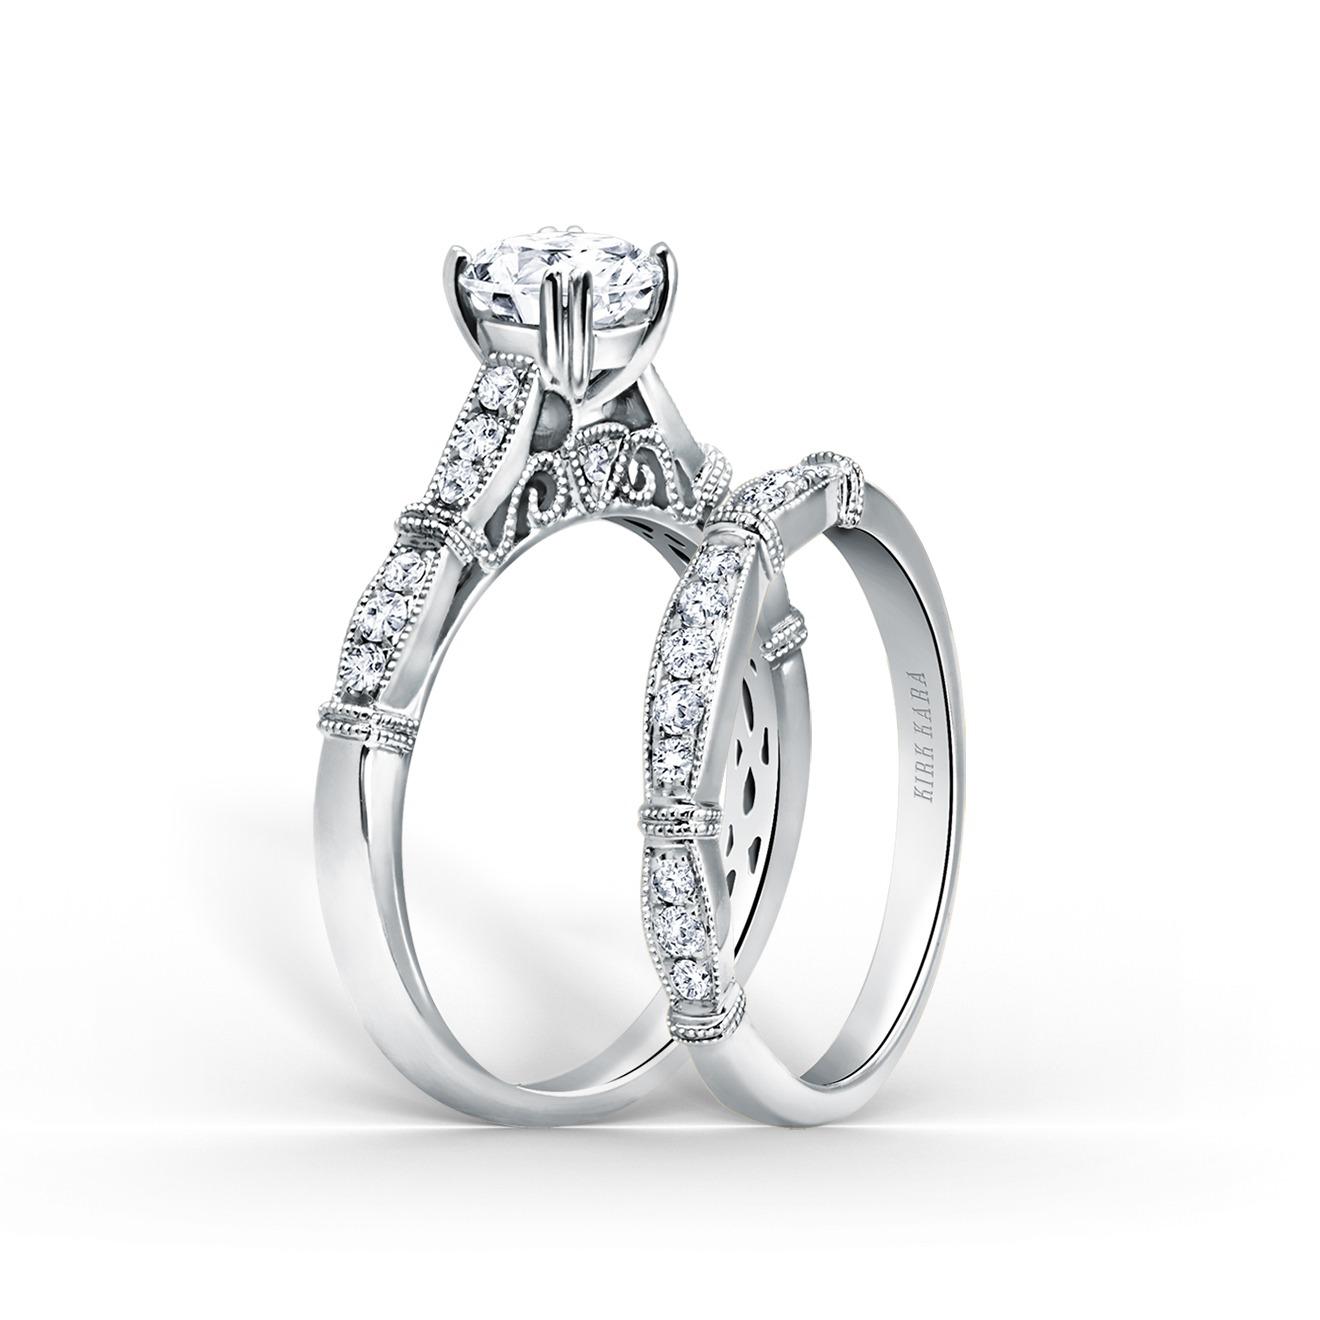 Filigree Ring Bands: Stella Filigree And Milgrain Edging Engagement Ring And